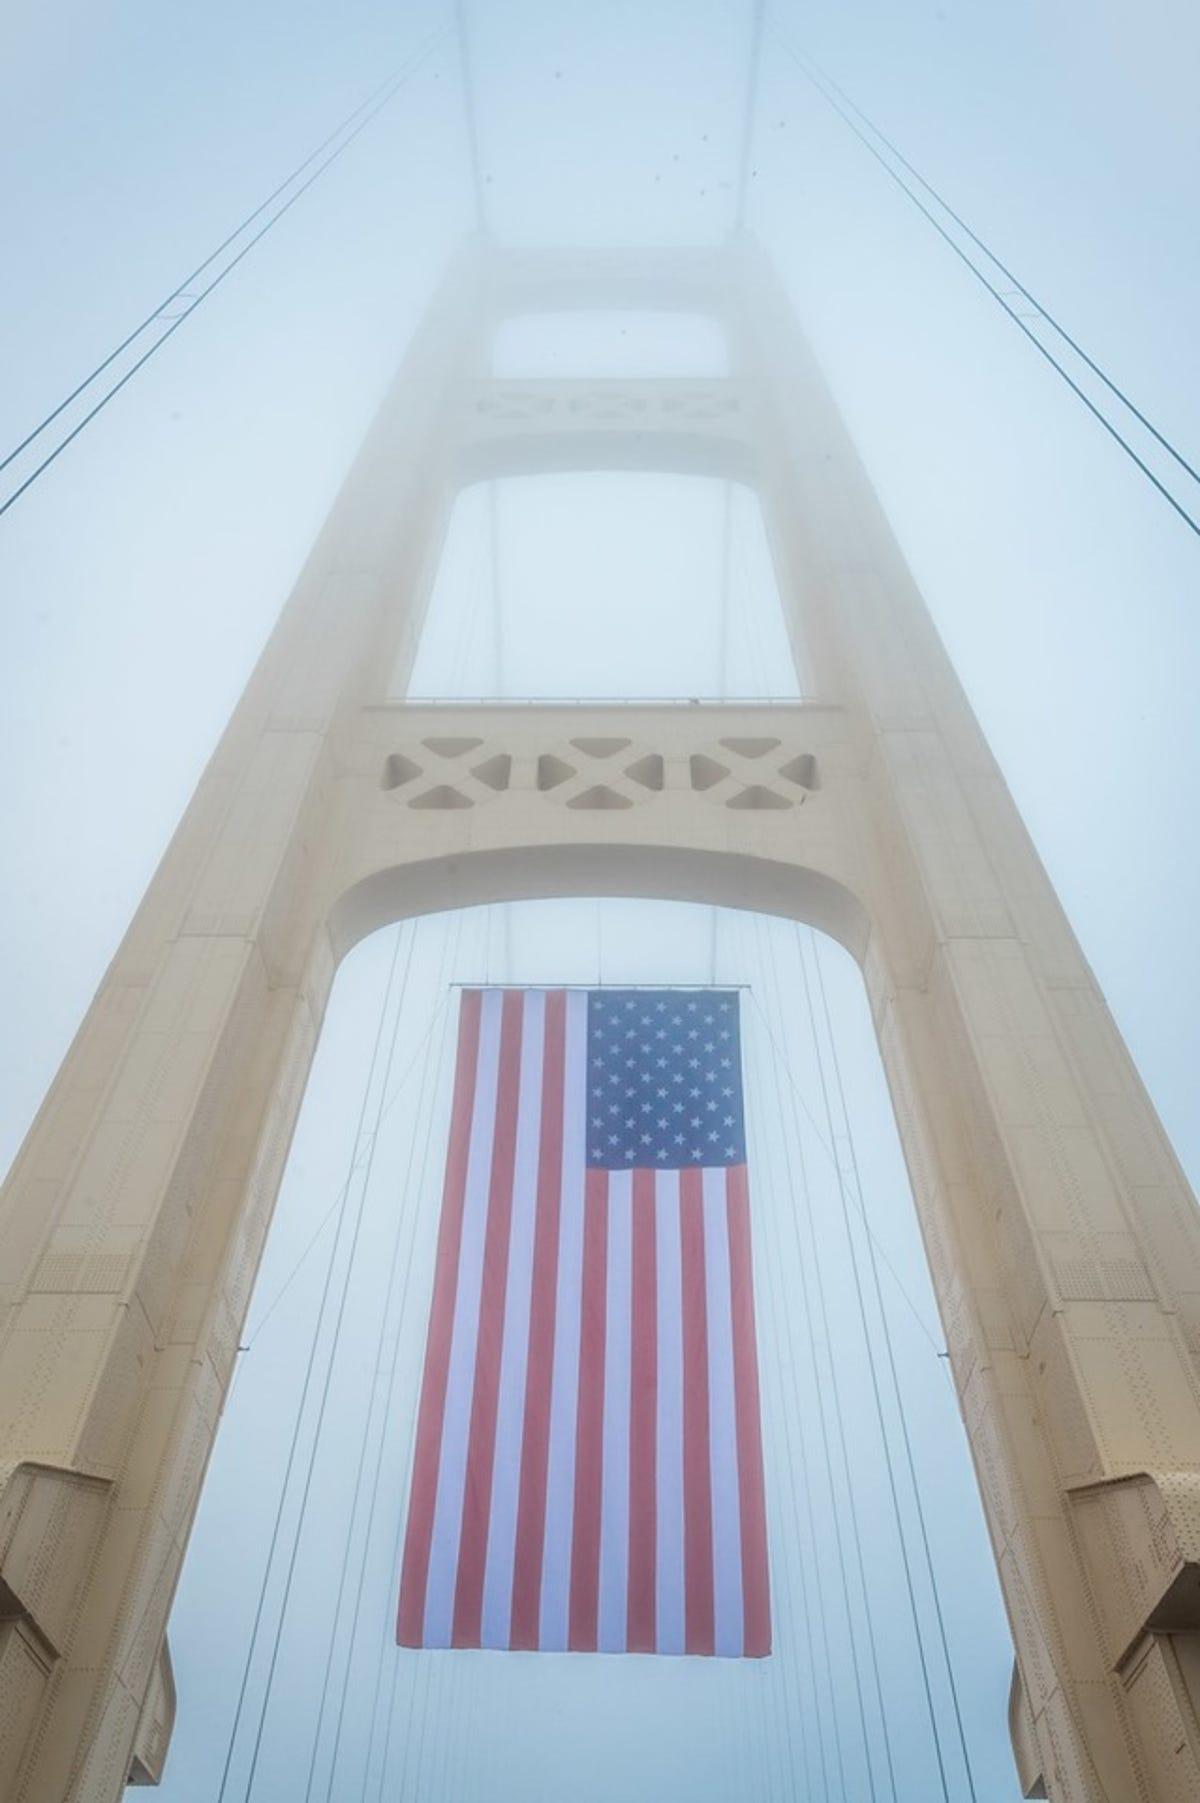 Giant flag honoring 9/11 victims hangs from Mackinac Bridge